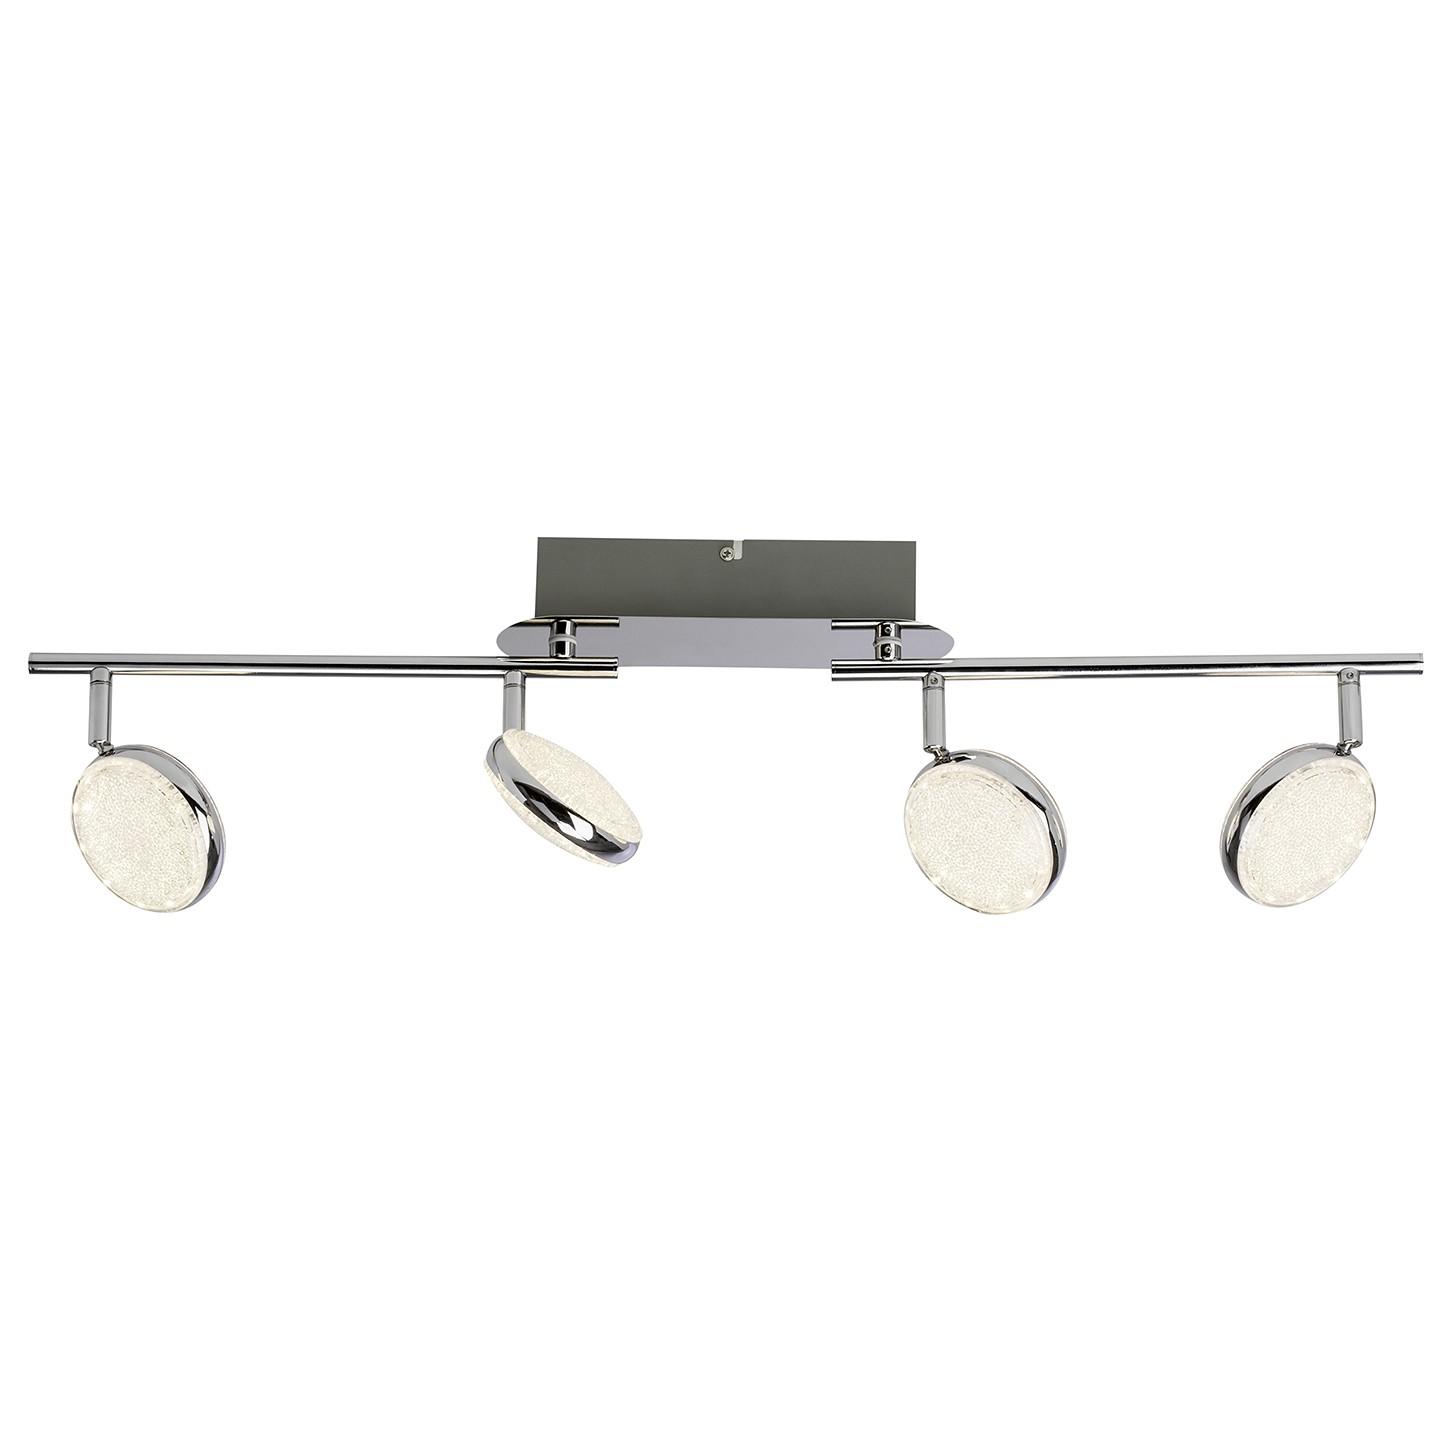 Plafonnier LED Cassy